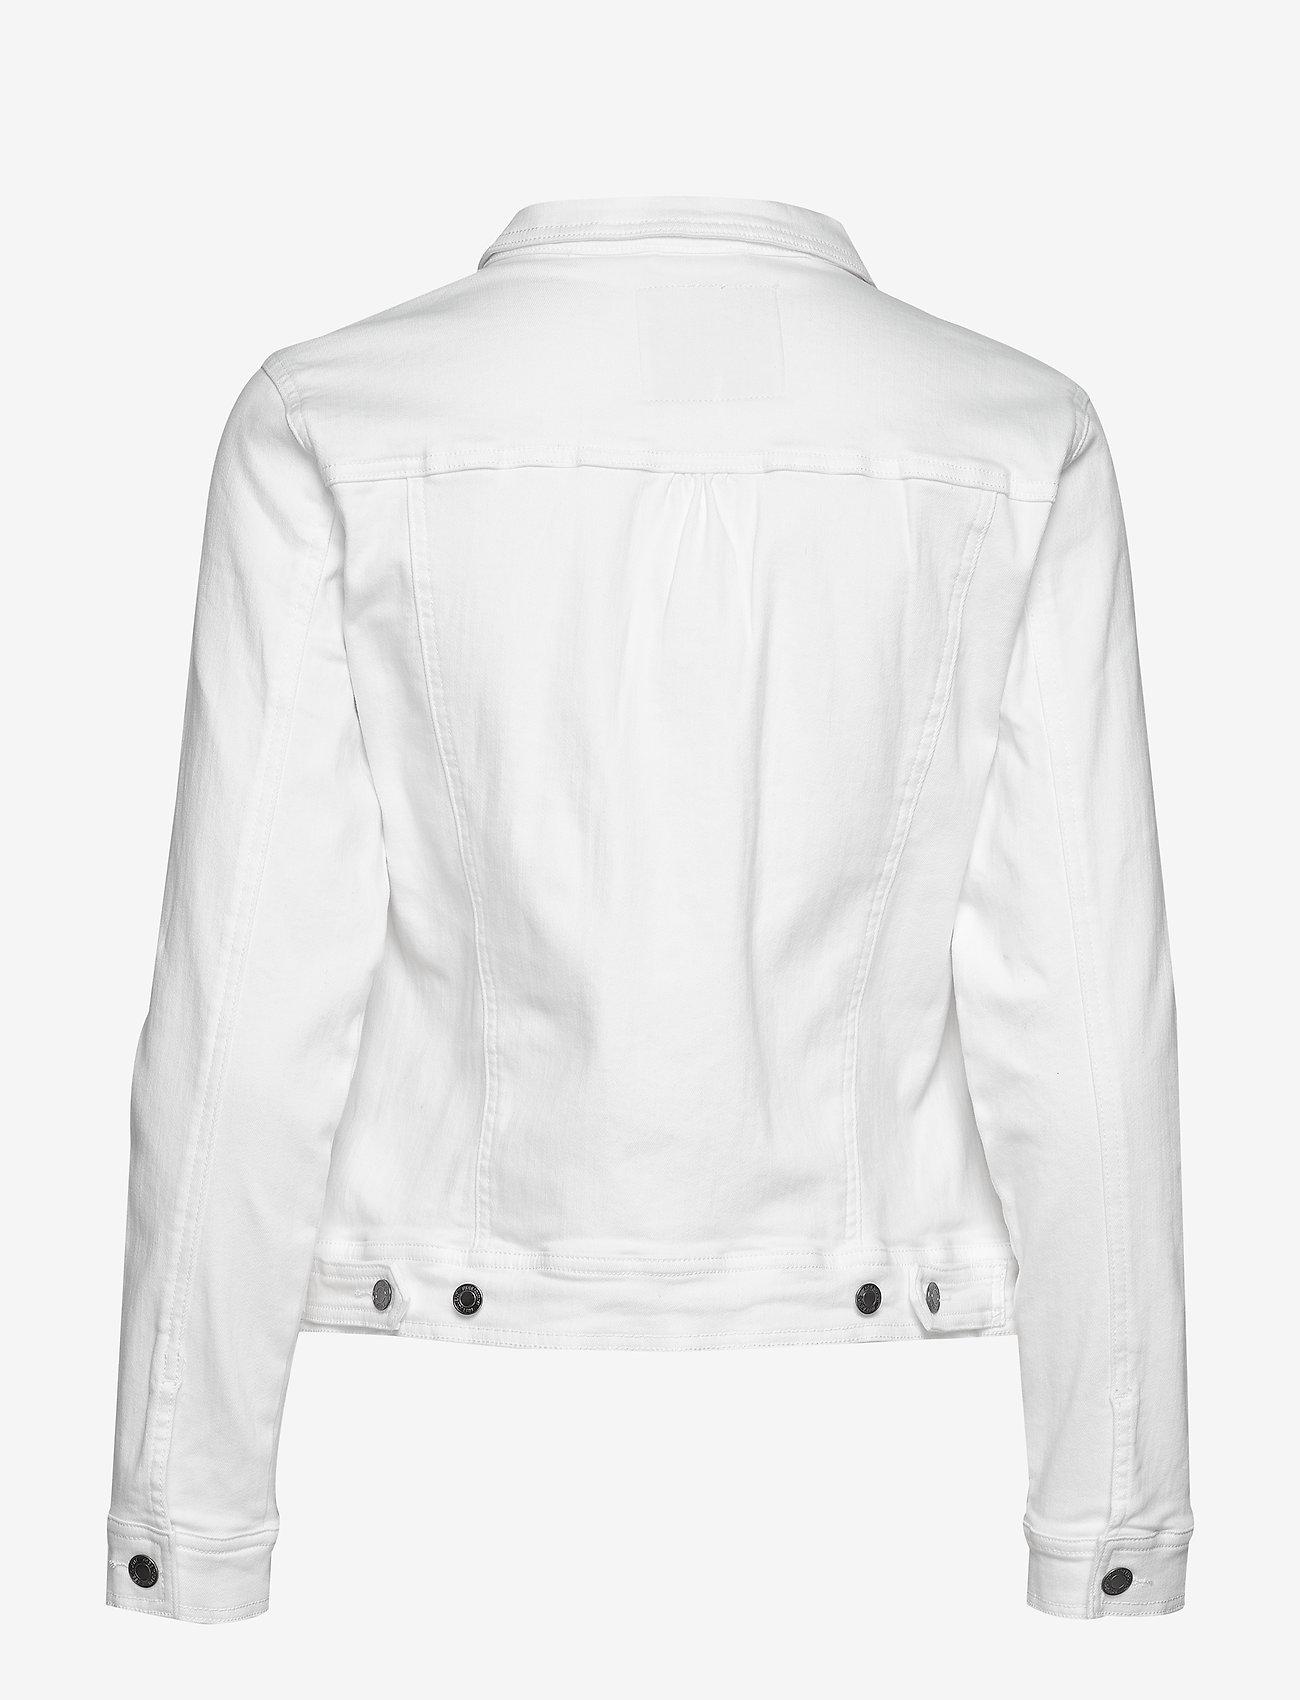 Free/quent Alba-ja-twill - Jackor & Kappor Bright White 11-0601